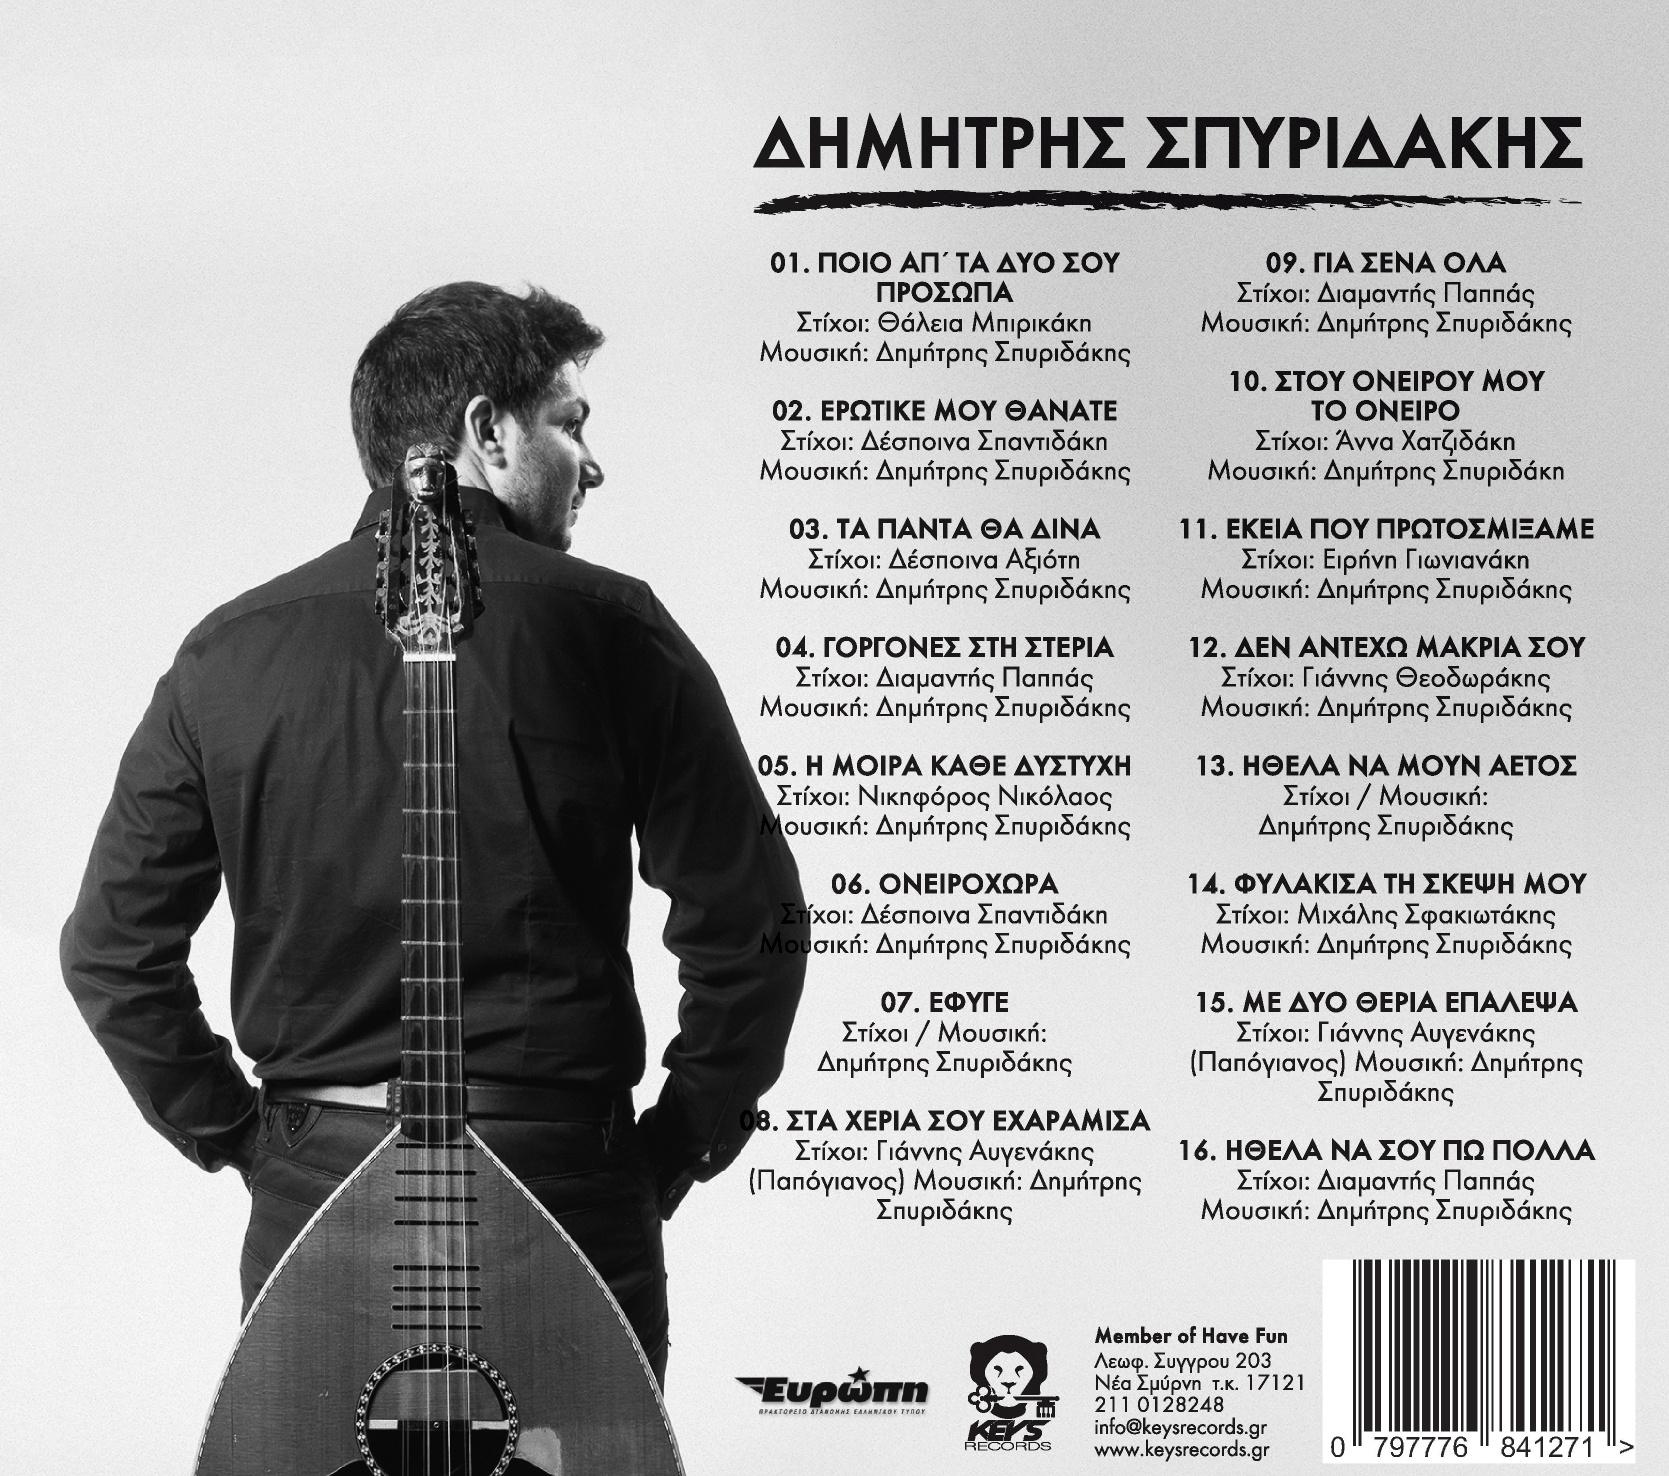 Spyridakis-CD-Back